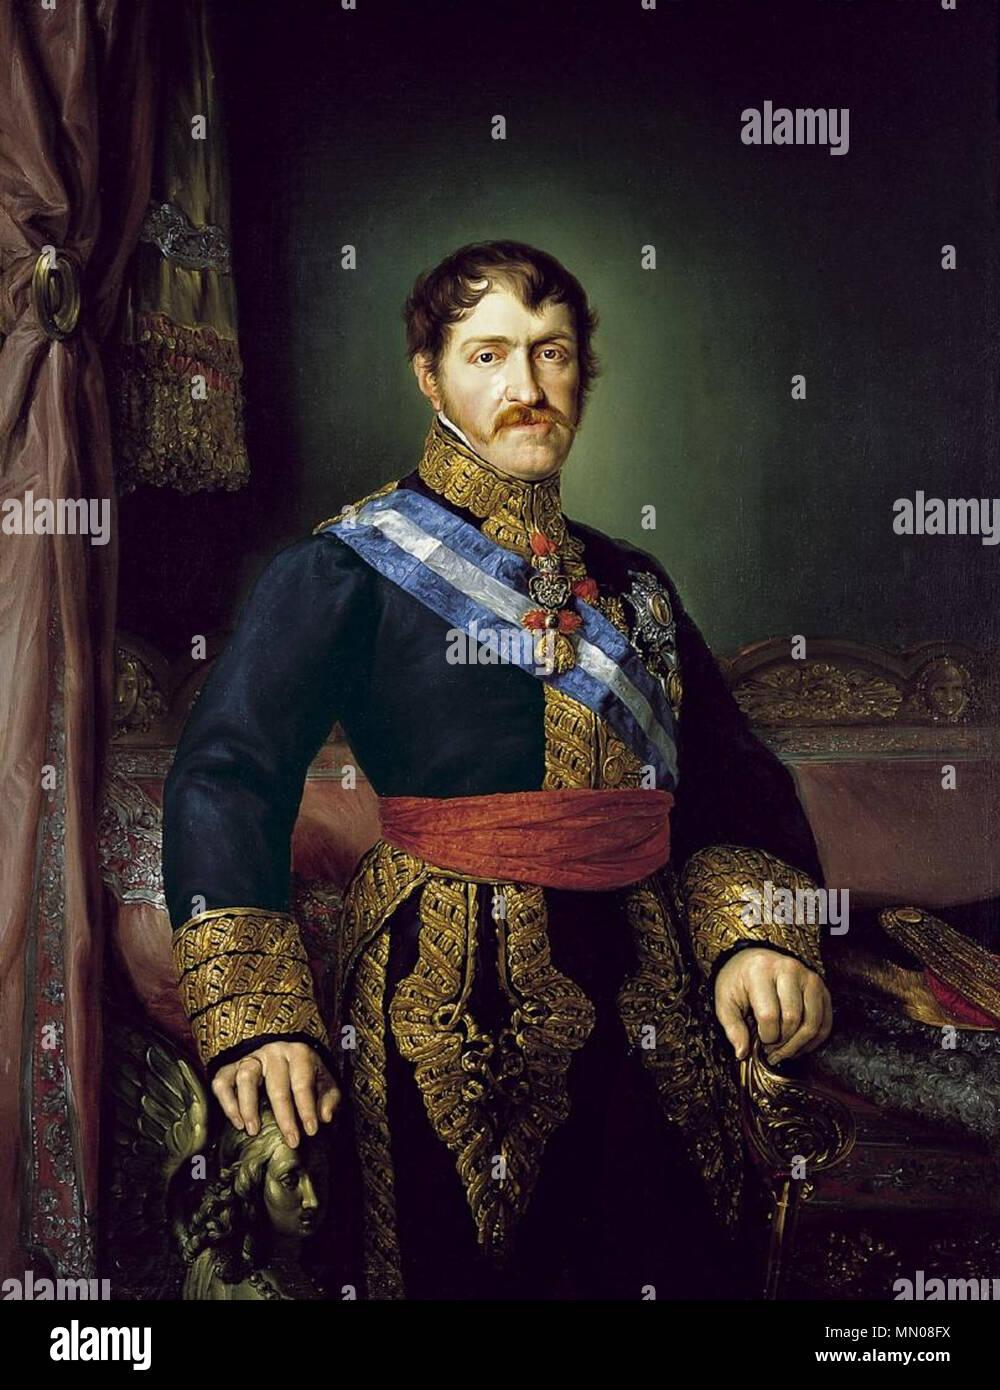 Carlos Iv De España High Resolution Stock Photography And Images Alamy